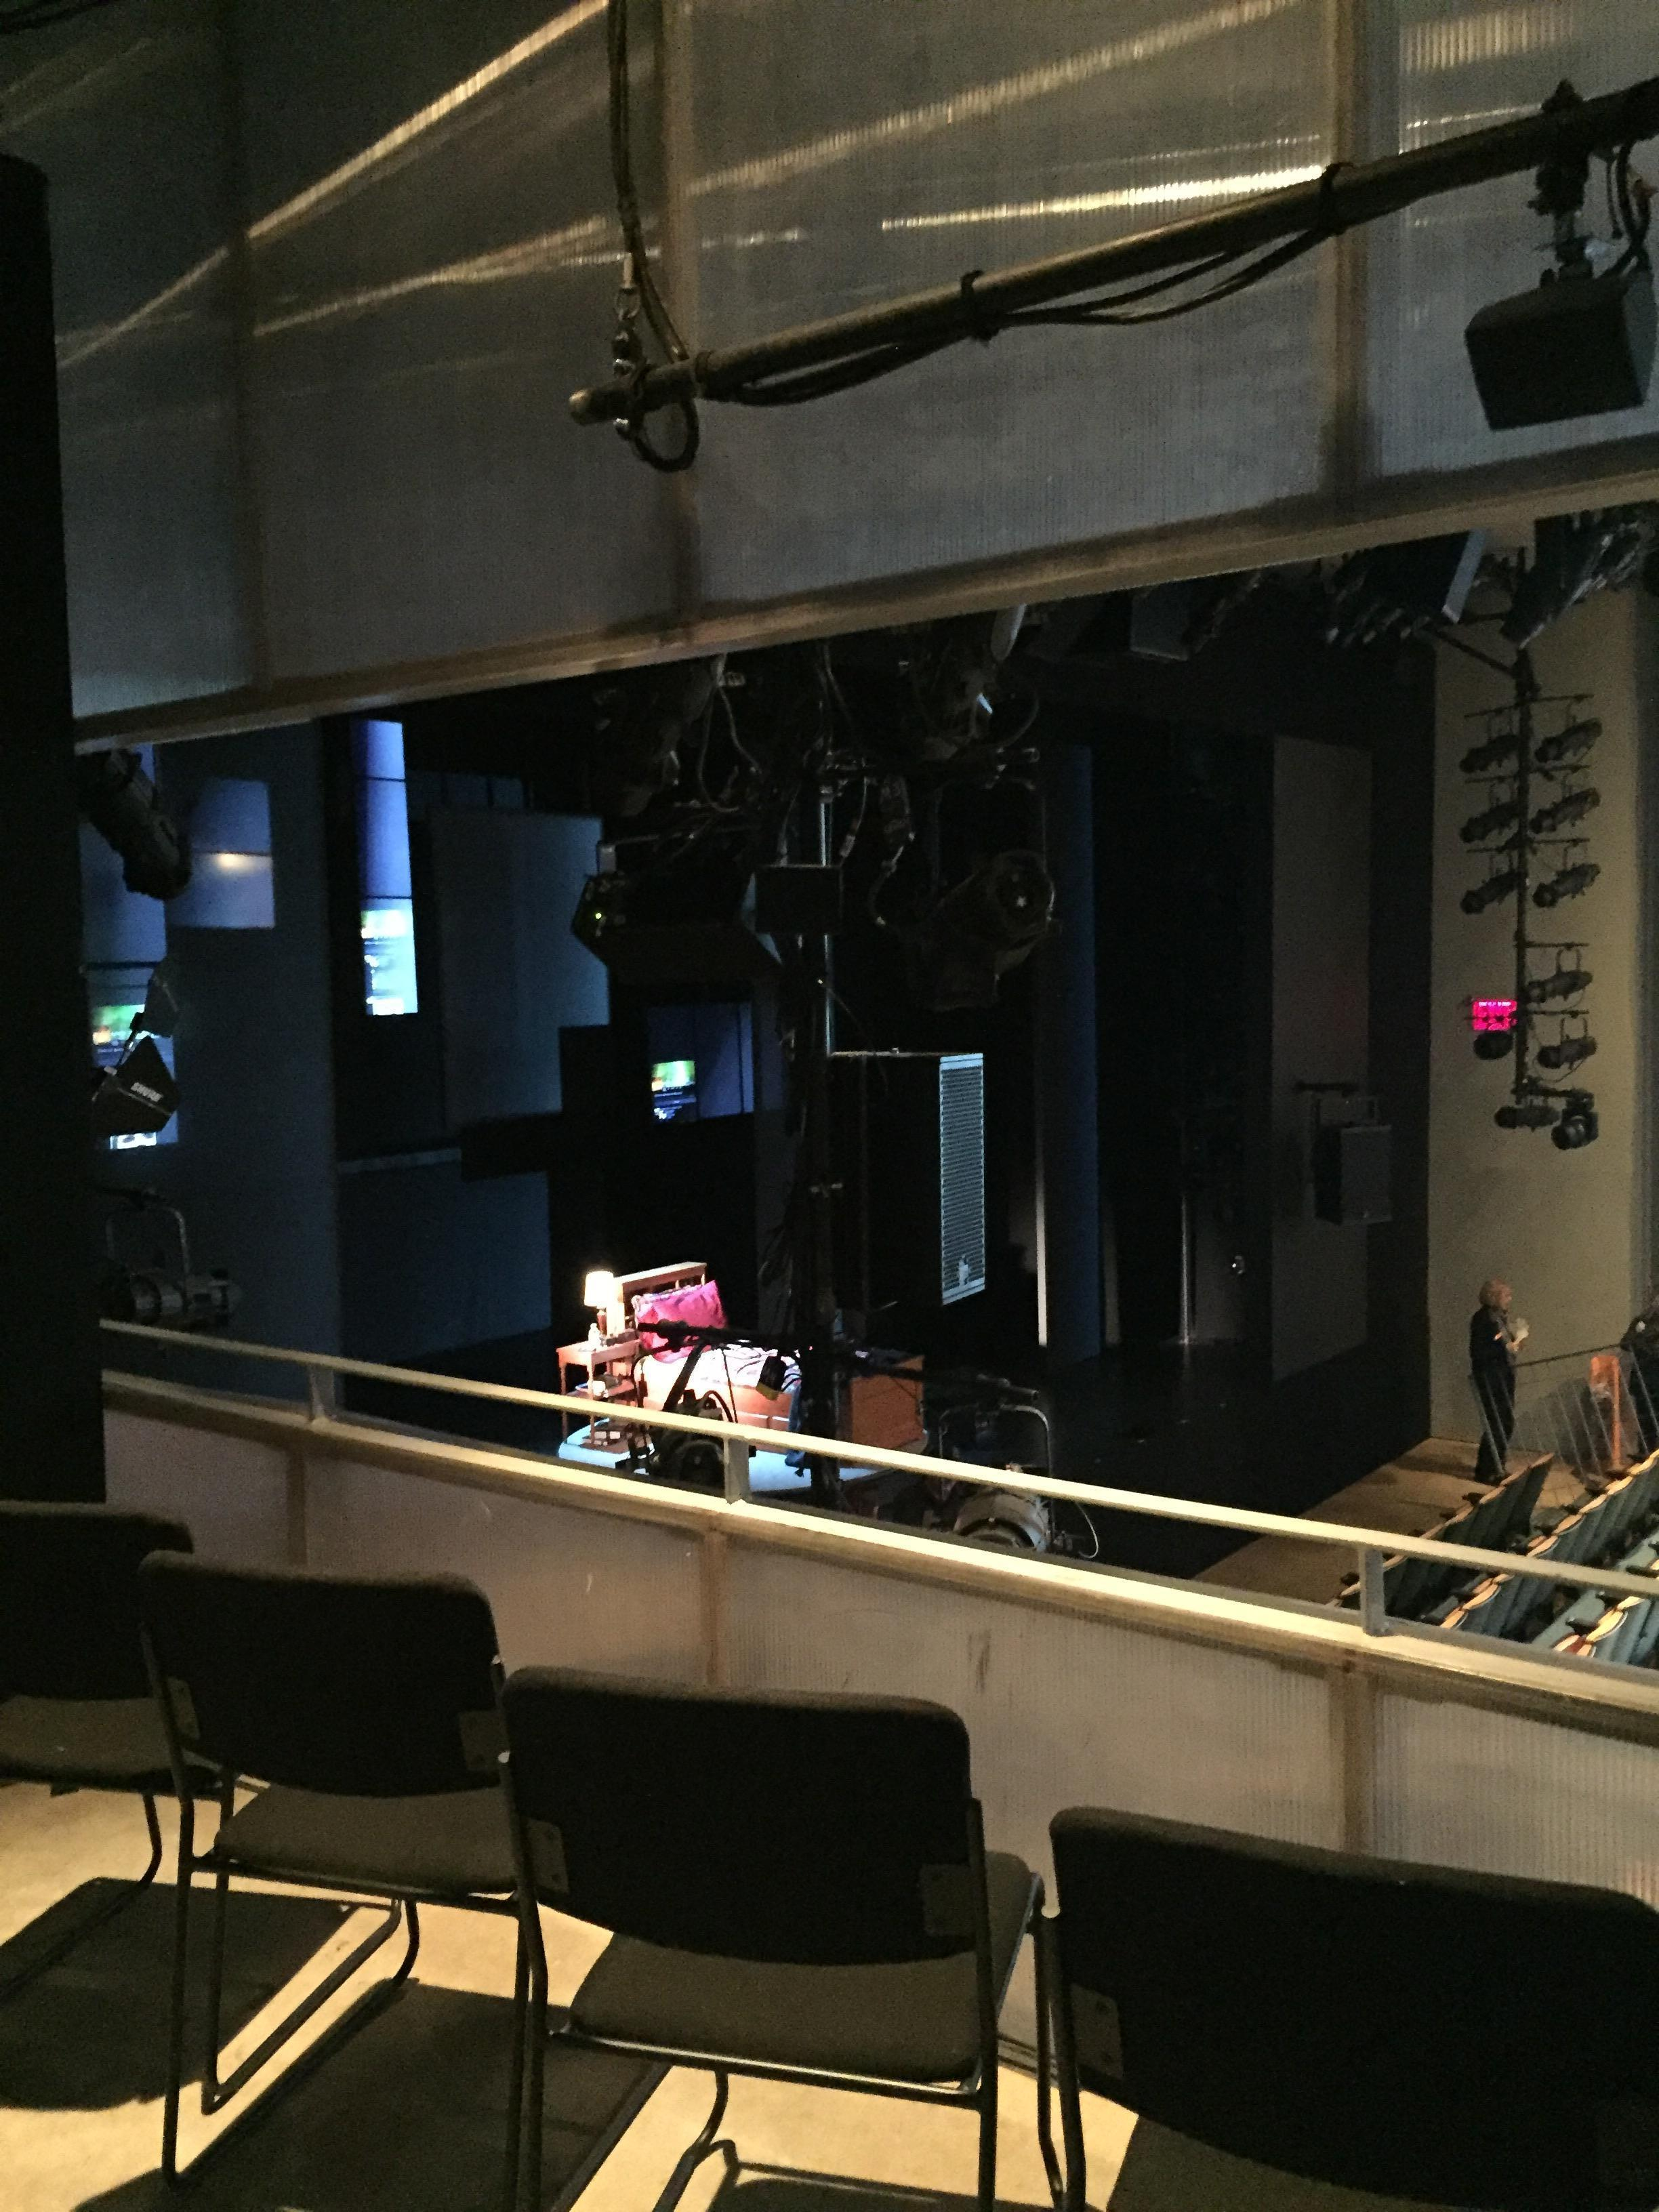 Tony Kiser Theatre Section Stool Row BD Seat 1